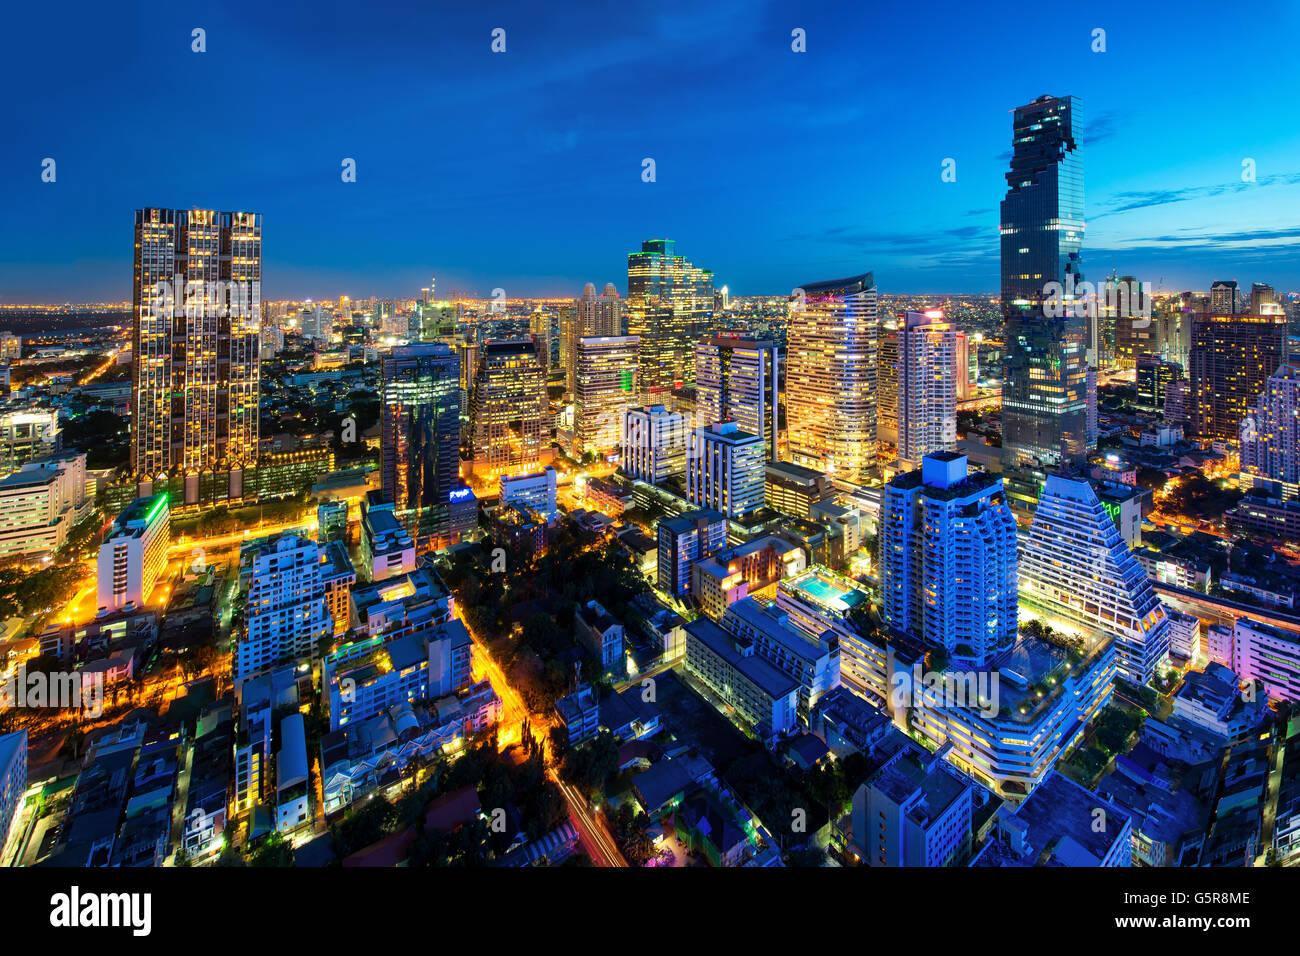 Stadtbild Bangkok in Thailand. Bangkok-Nachtansicht im Geschäftsviertel, Thailand. Bangkok-Wolkenkratzer. Bangkok Stockbild